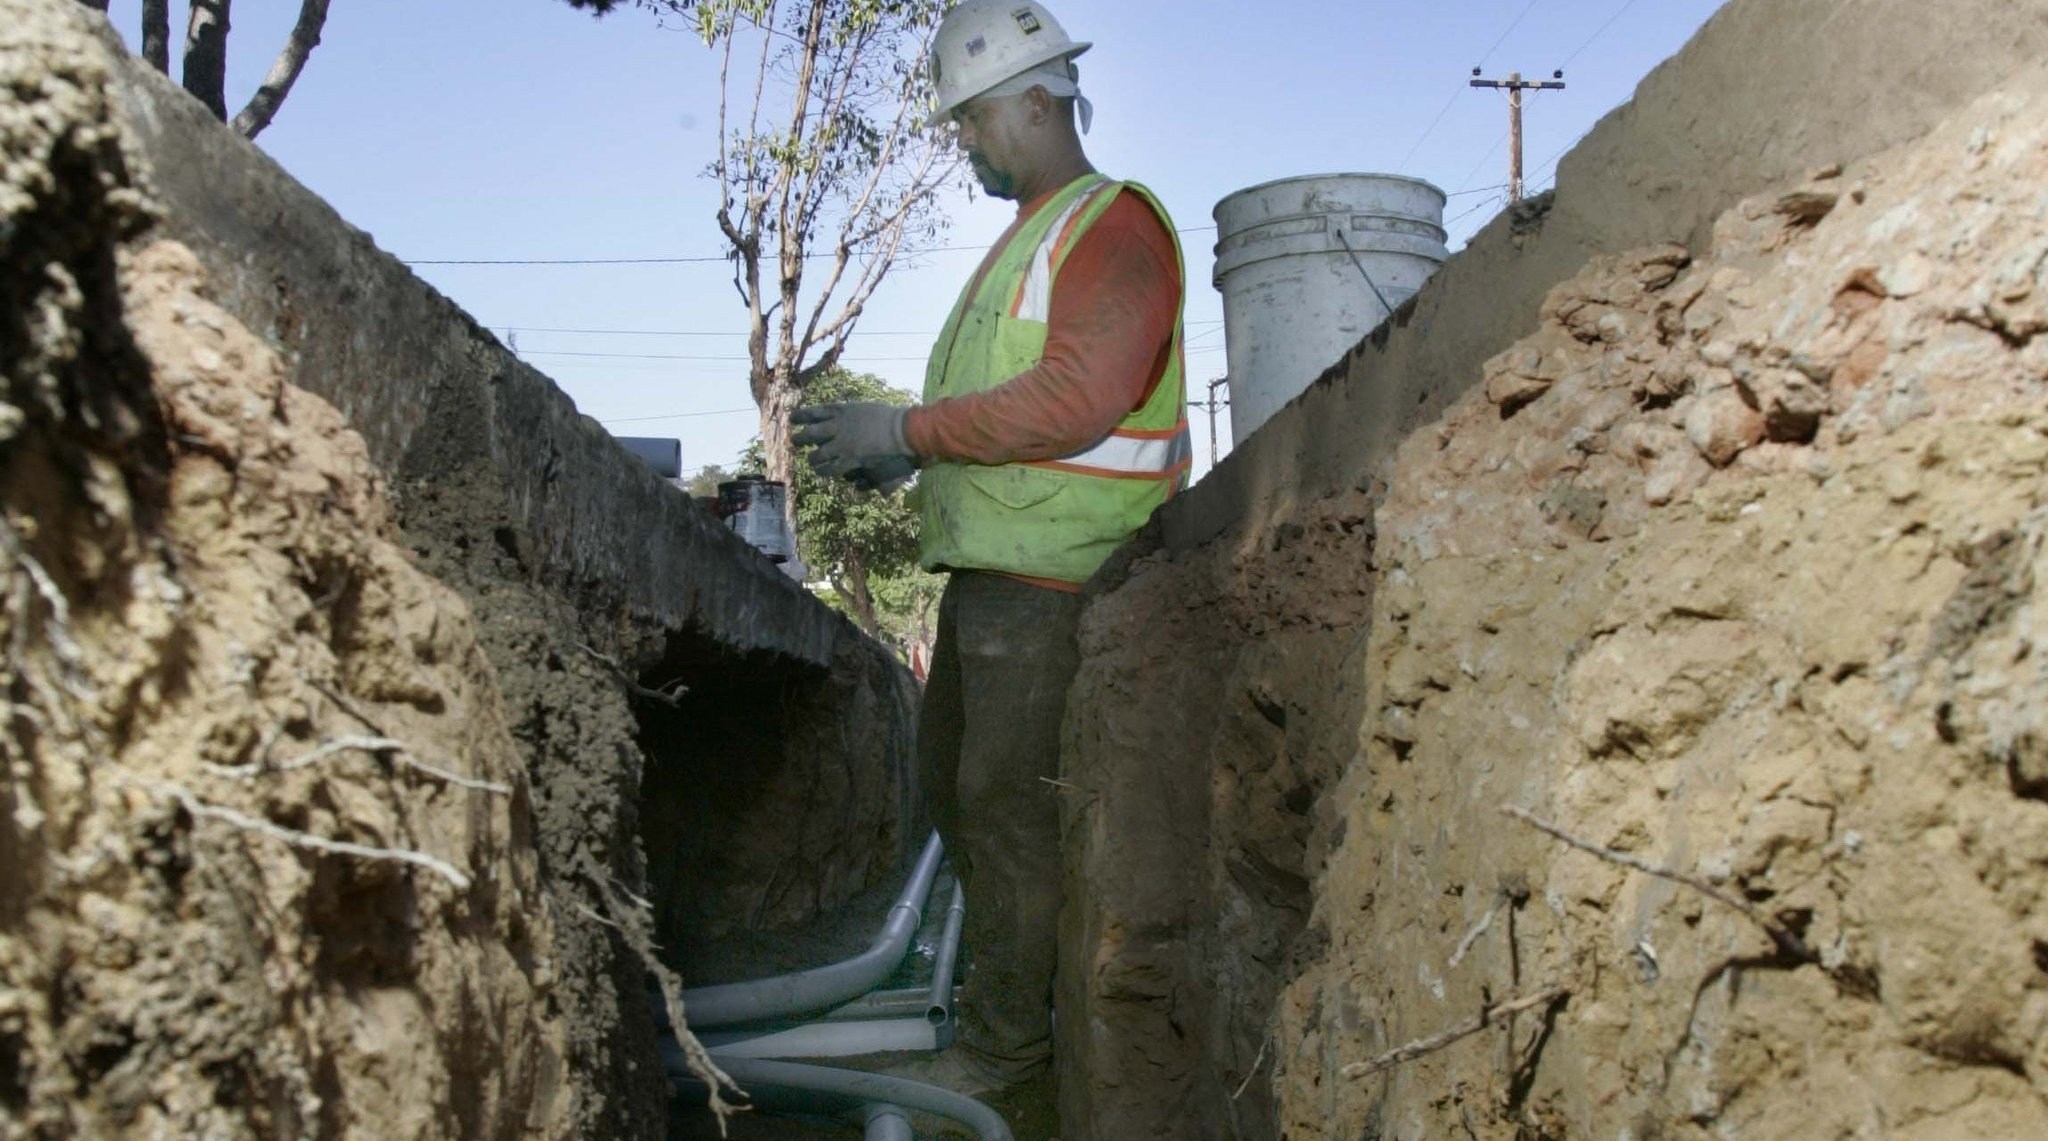 Undergrounding of electric supply lines in San Diego neighborhood.